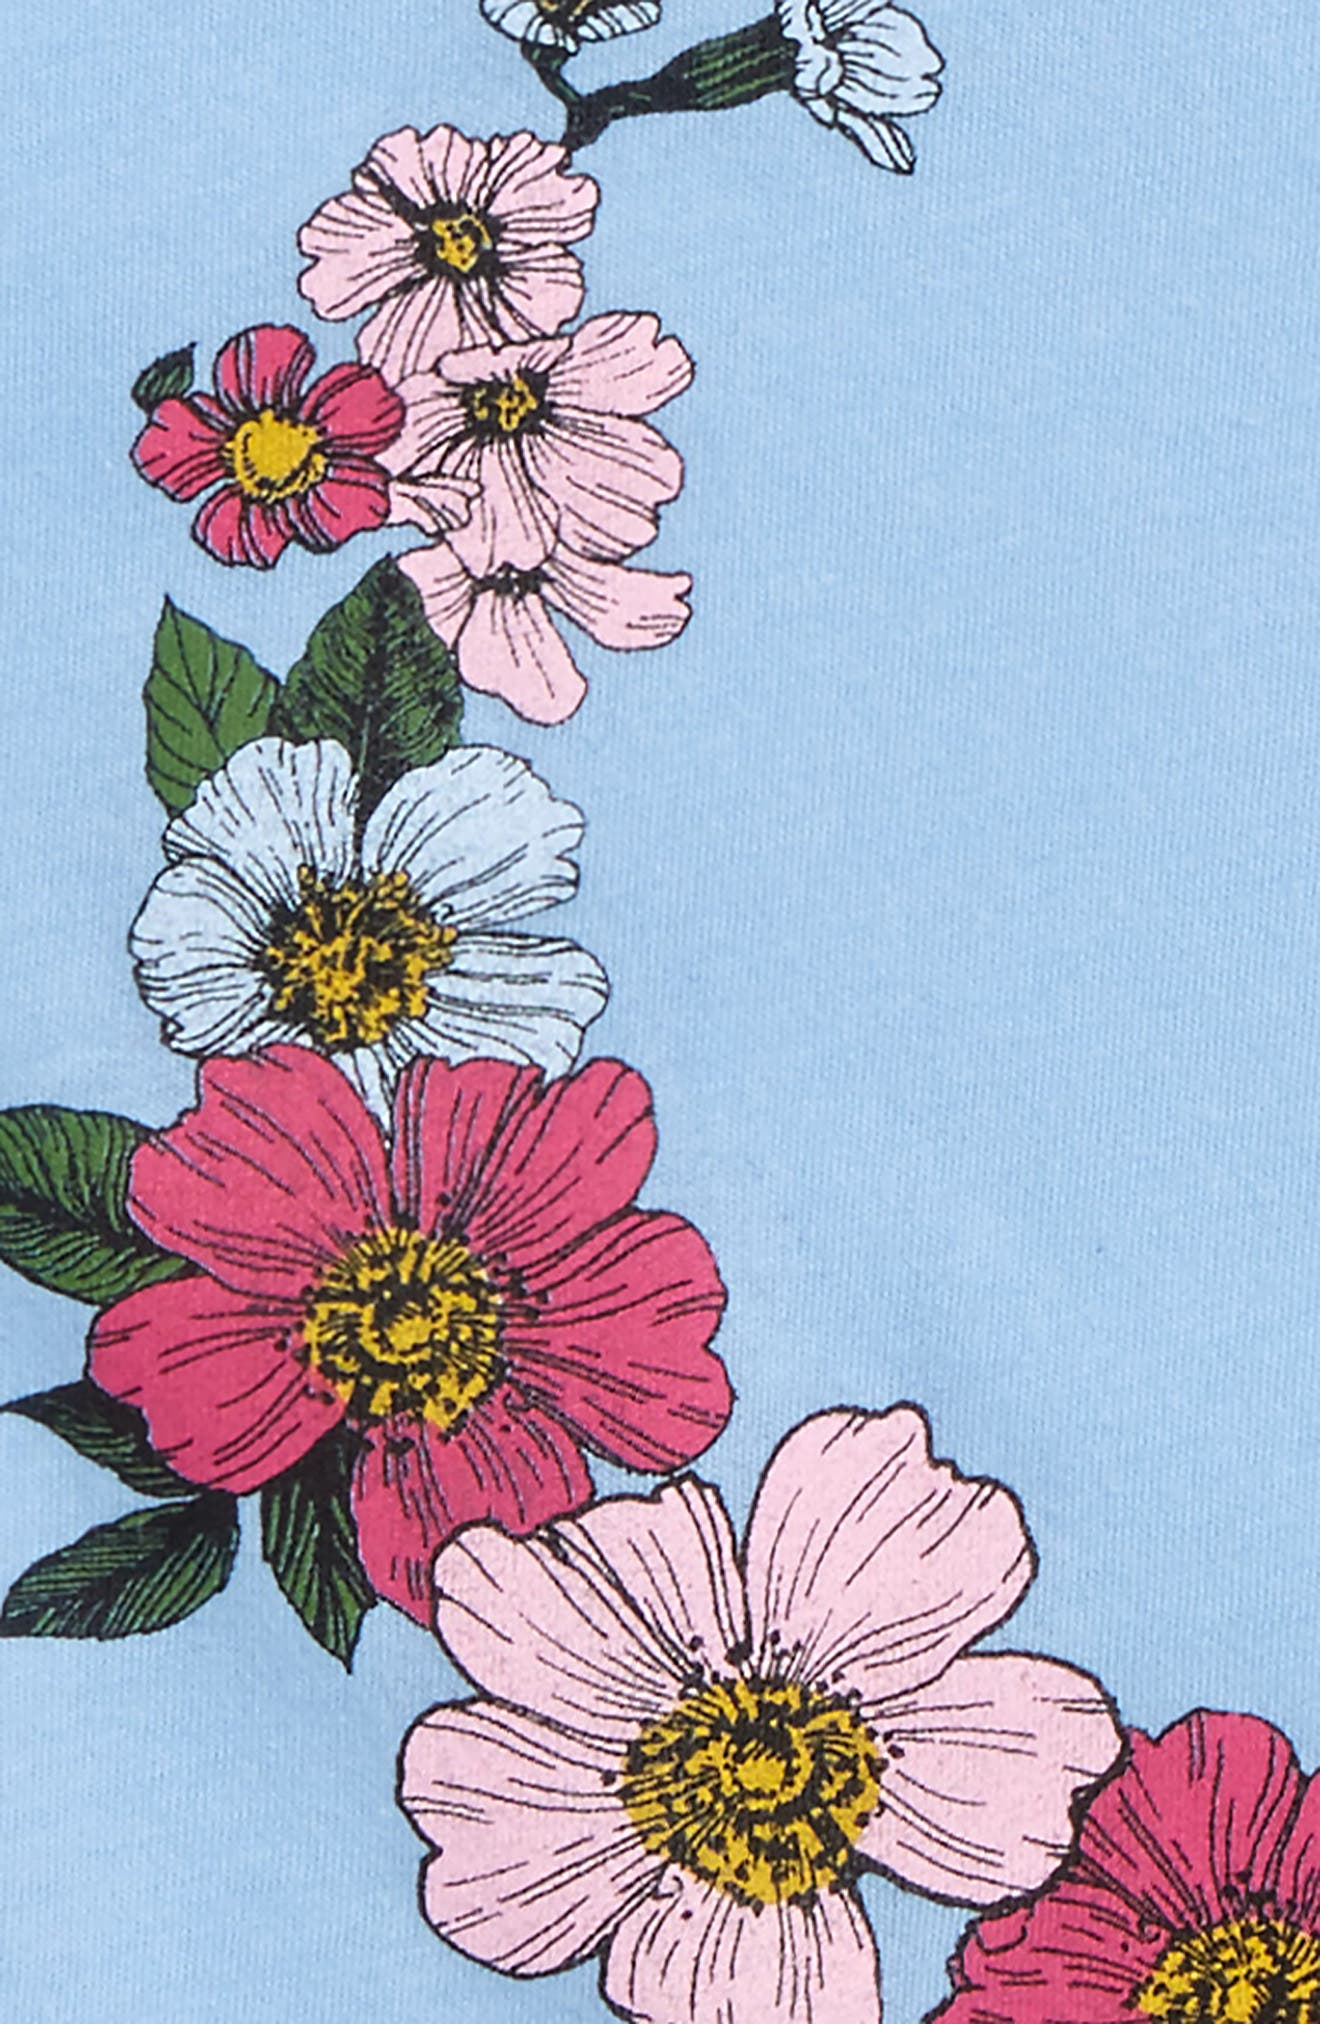 Moon Bloom Ruffle Tank,                             Alternate thumbnail 4, color,                             493